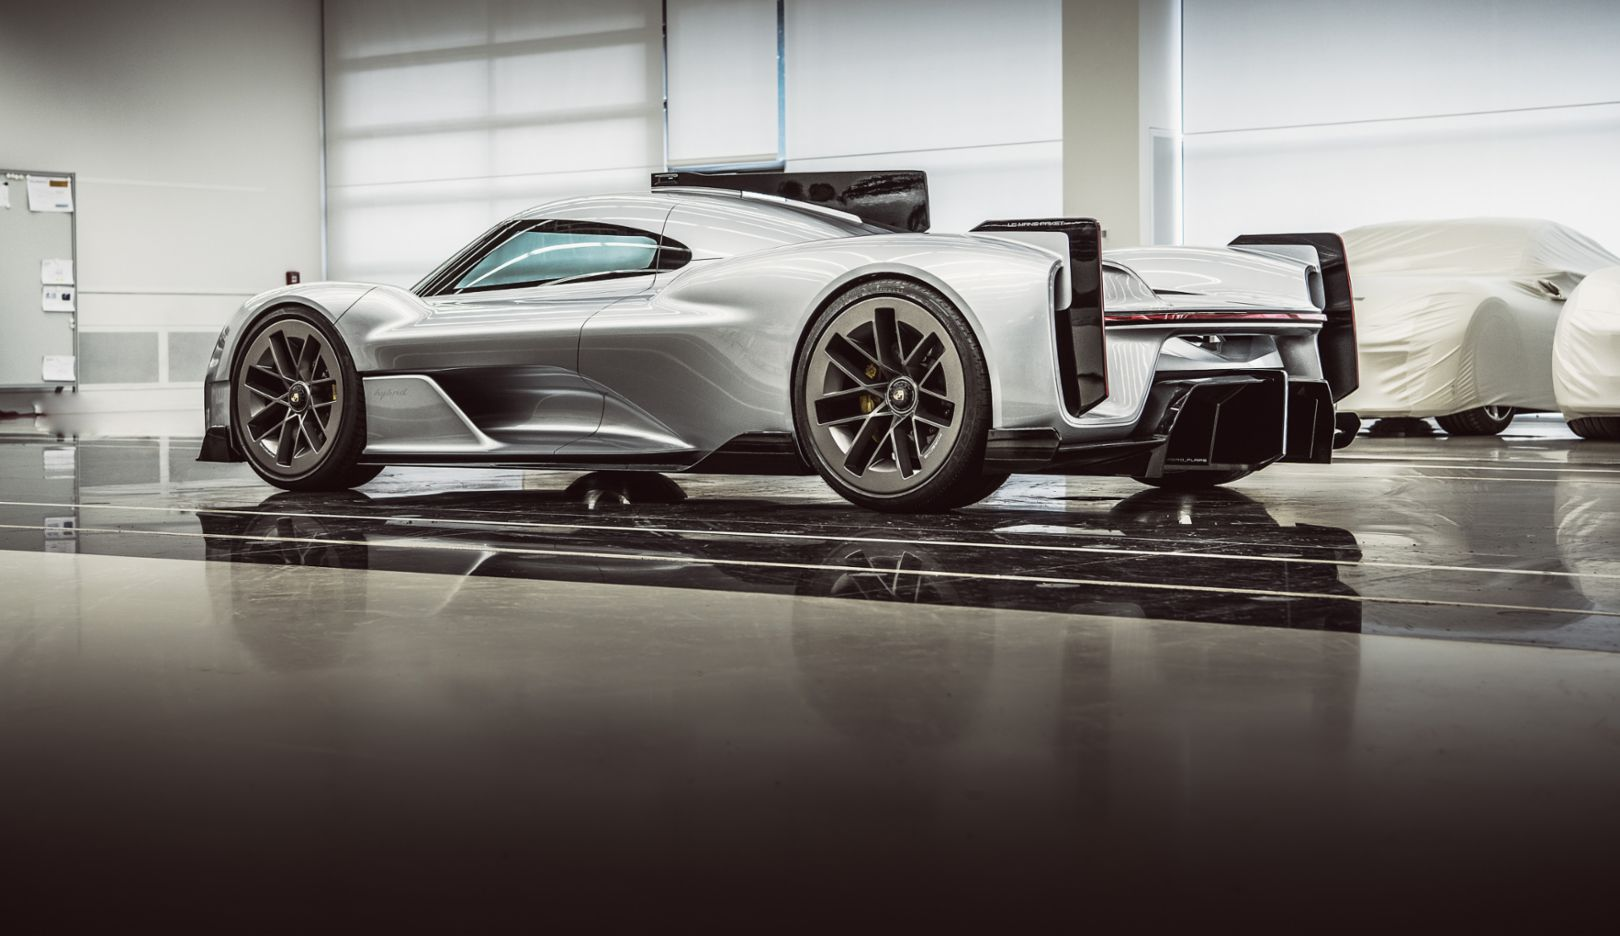 """Porsche Unseen"" provides a glimpse of unreleased concept cars - Image 5"